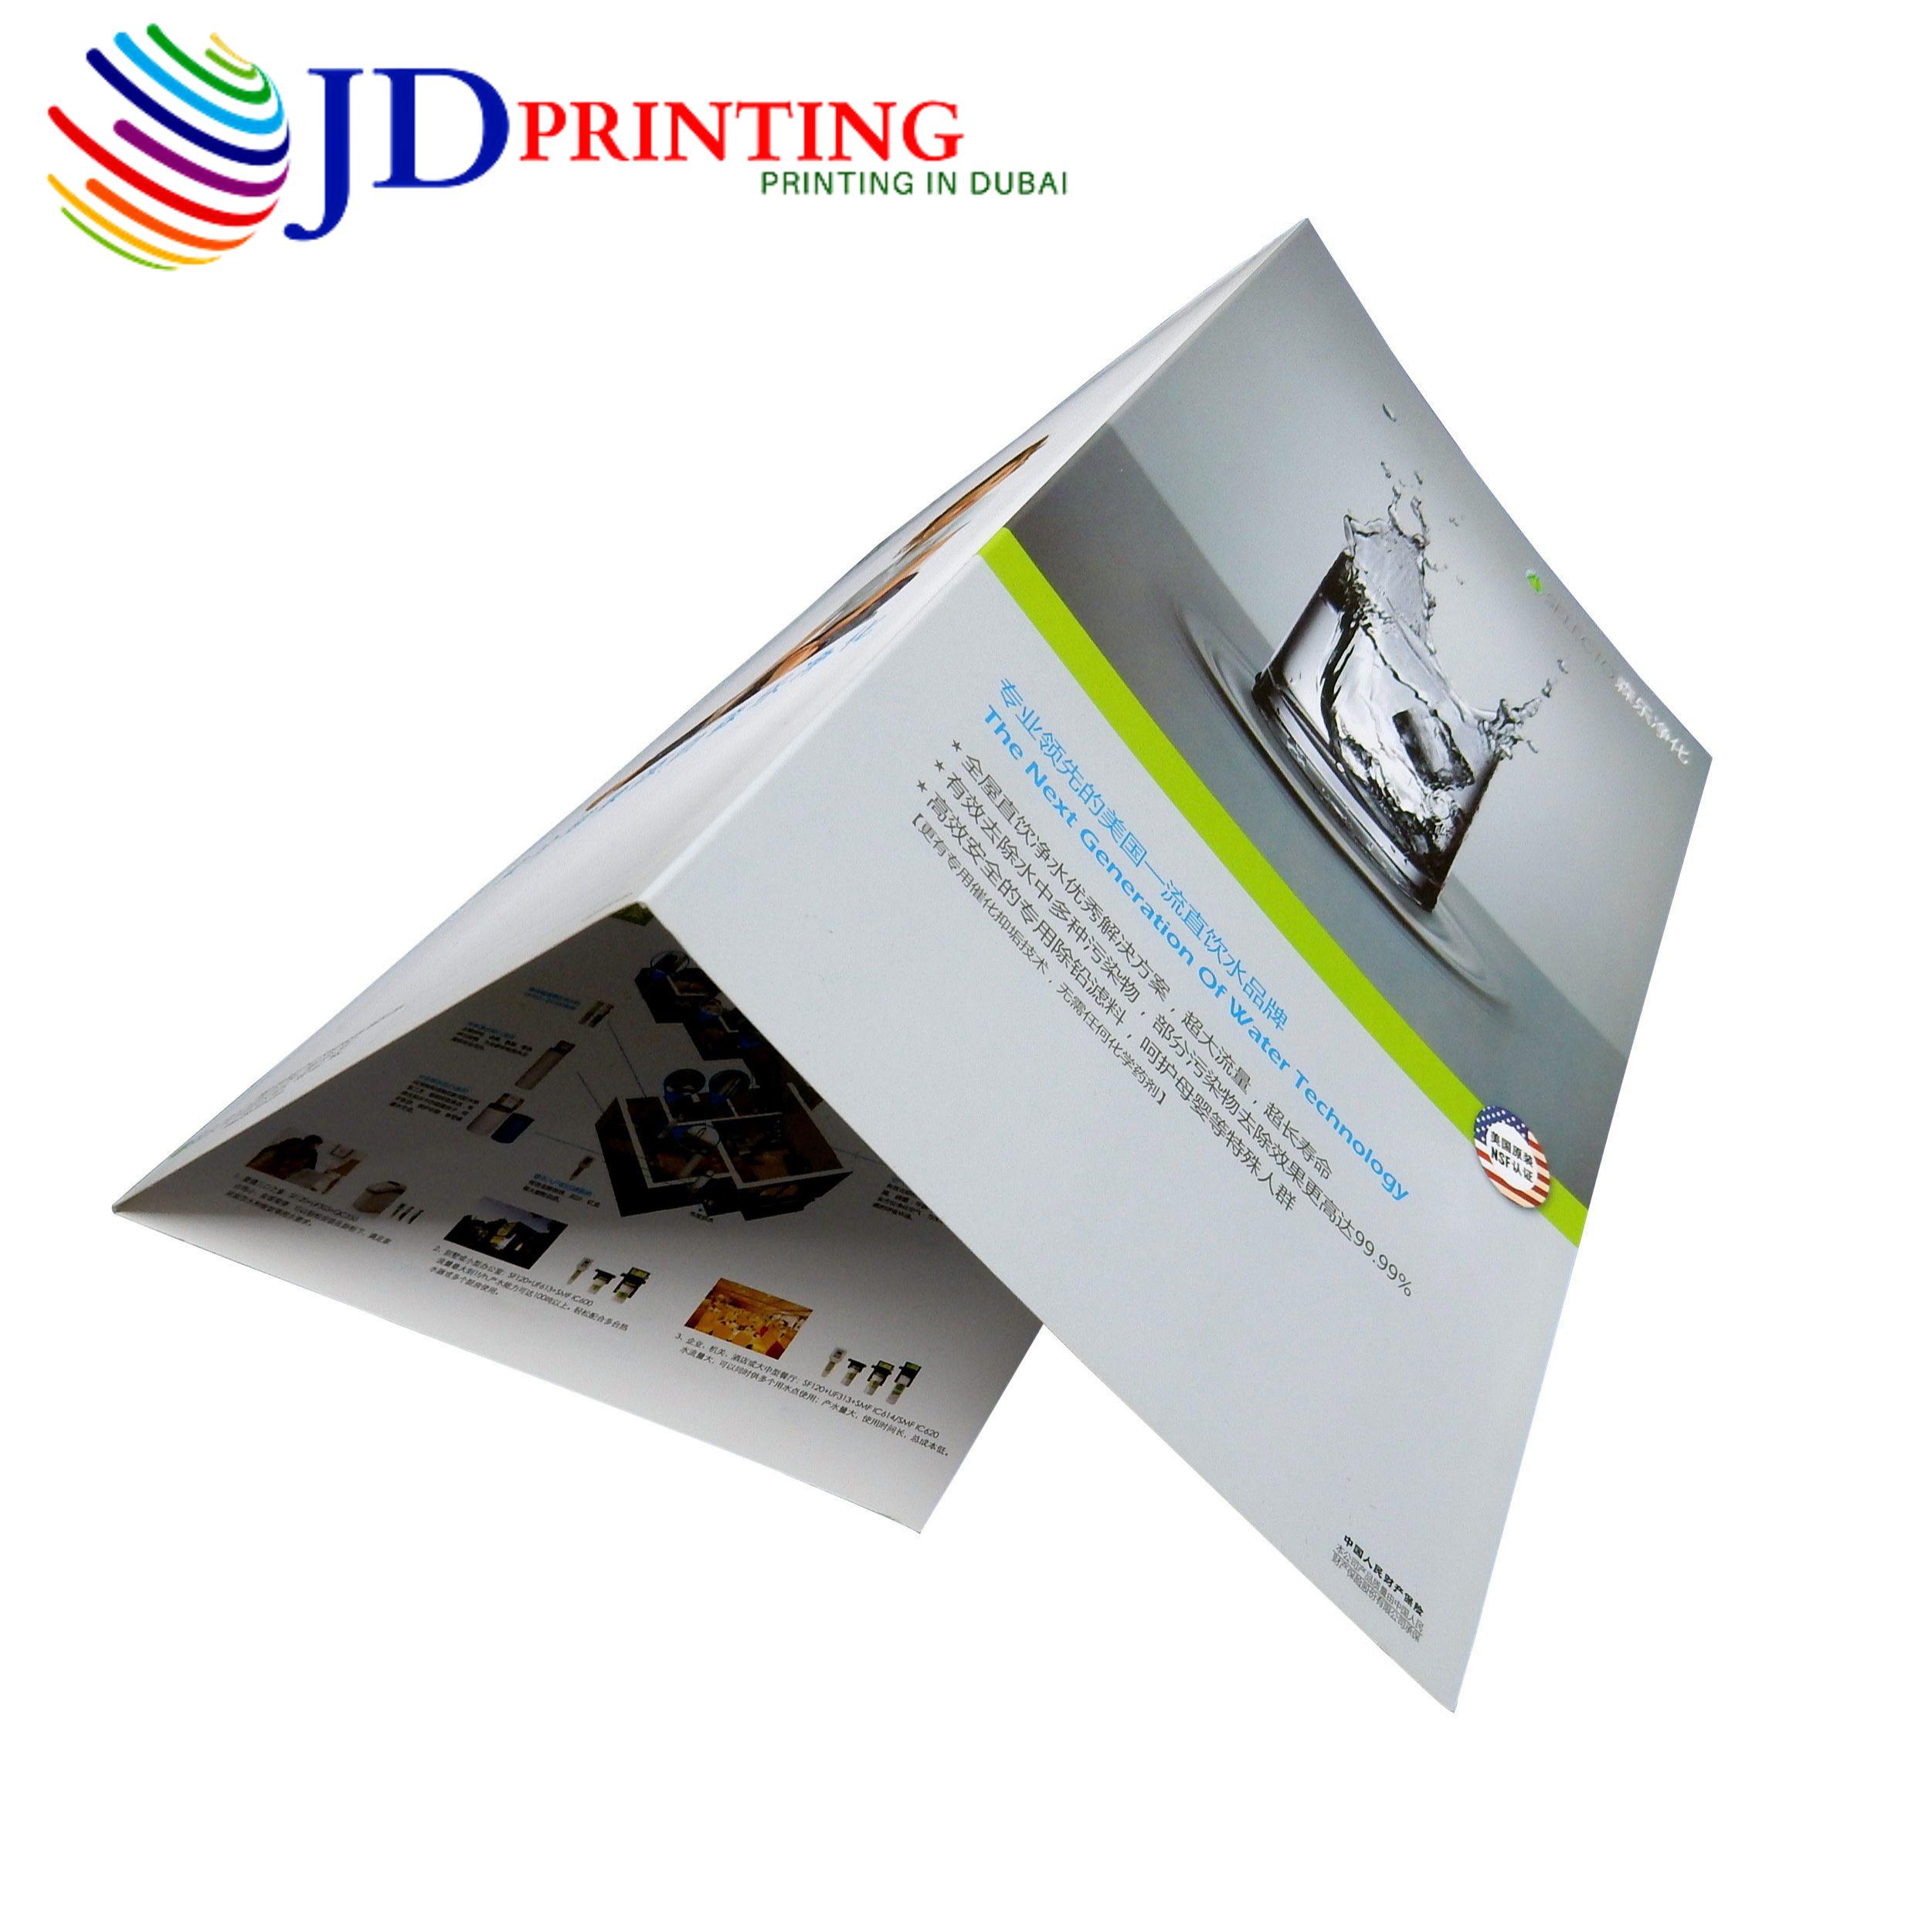 Brochure Flyers Printing Calendar Business Card Jd Printing Dubai Printing Flyer Printing Prints Stamp Printing